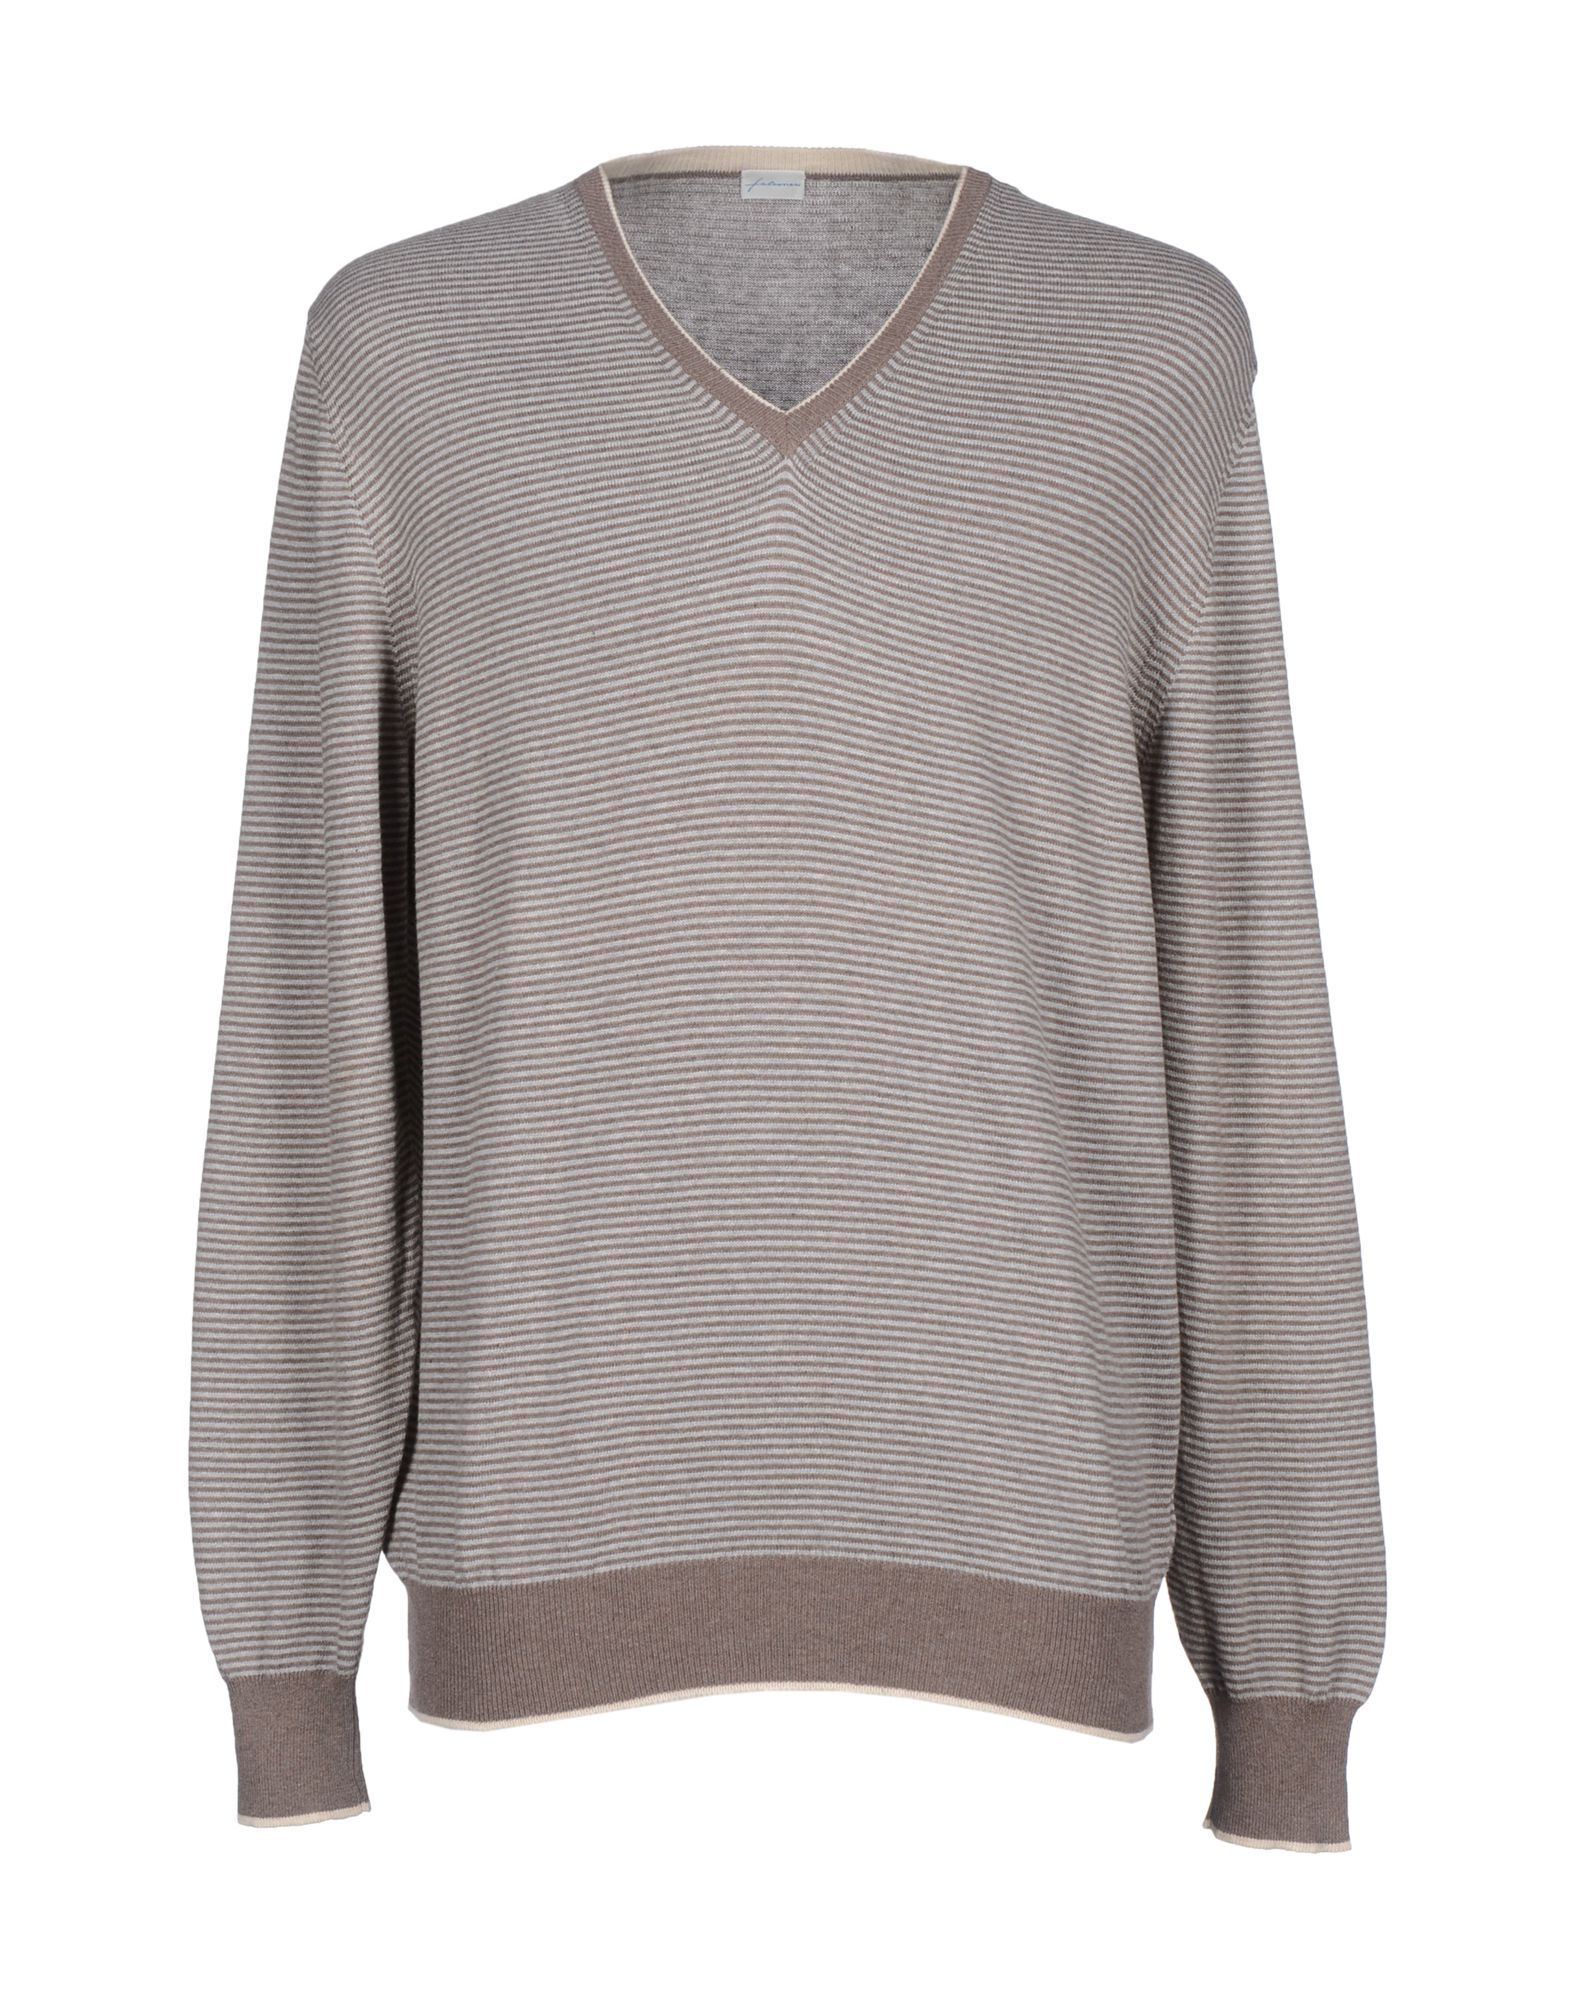 Falconeri clothing online